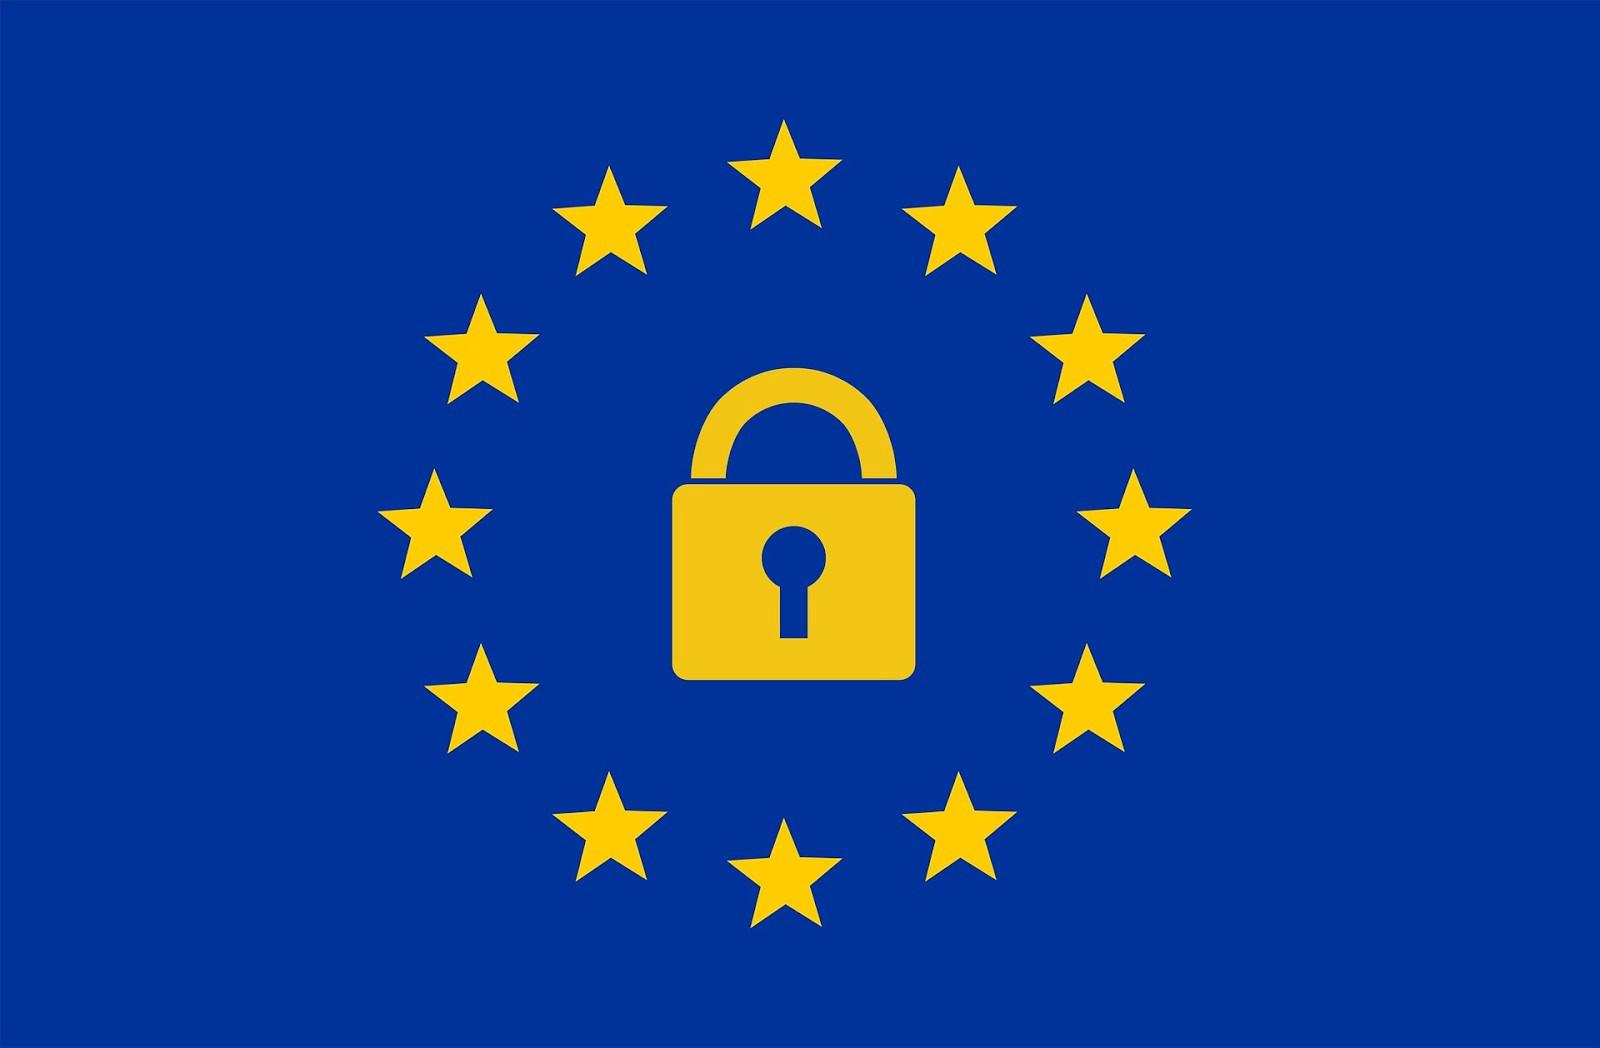 5b398b4372c Πώς οι νέοι κανόνες της ΕΕ προστατεύουν τα προσωπικά δεδομένα ...